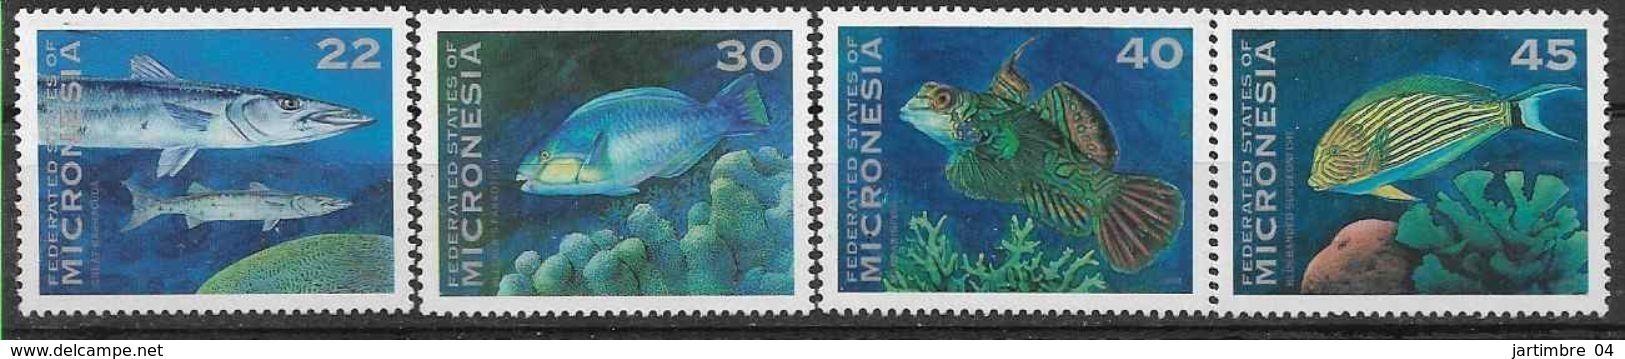 1993 MICRONESIE 246-49** Poissons - Micronésie